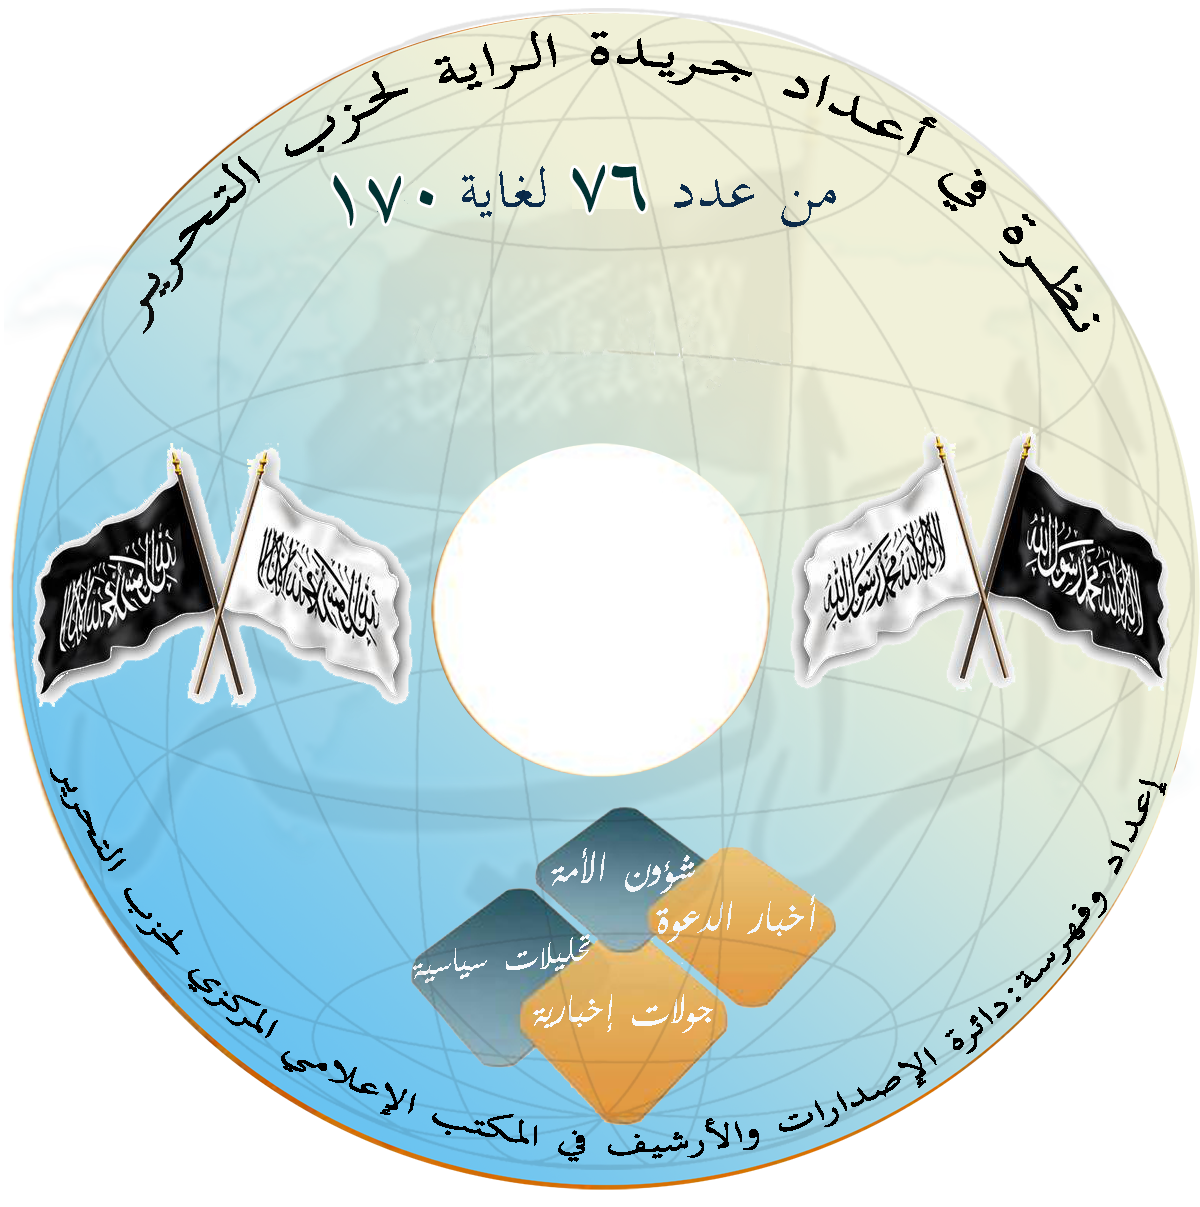 alRayah 3rd DVD 76 170 Rajab 2018 Sticker